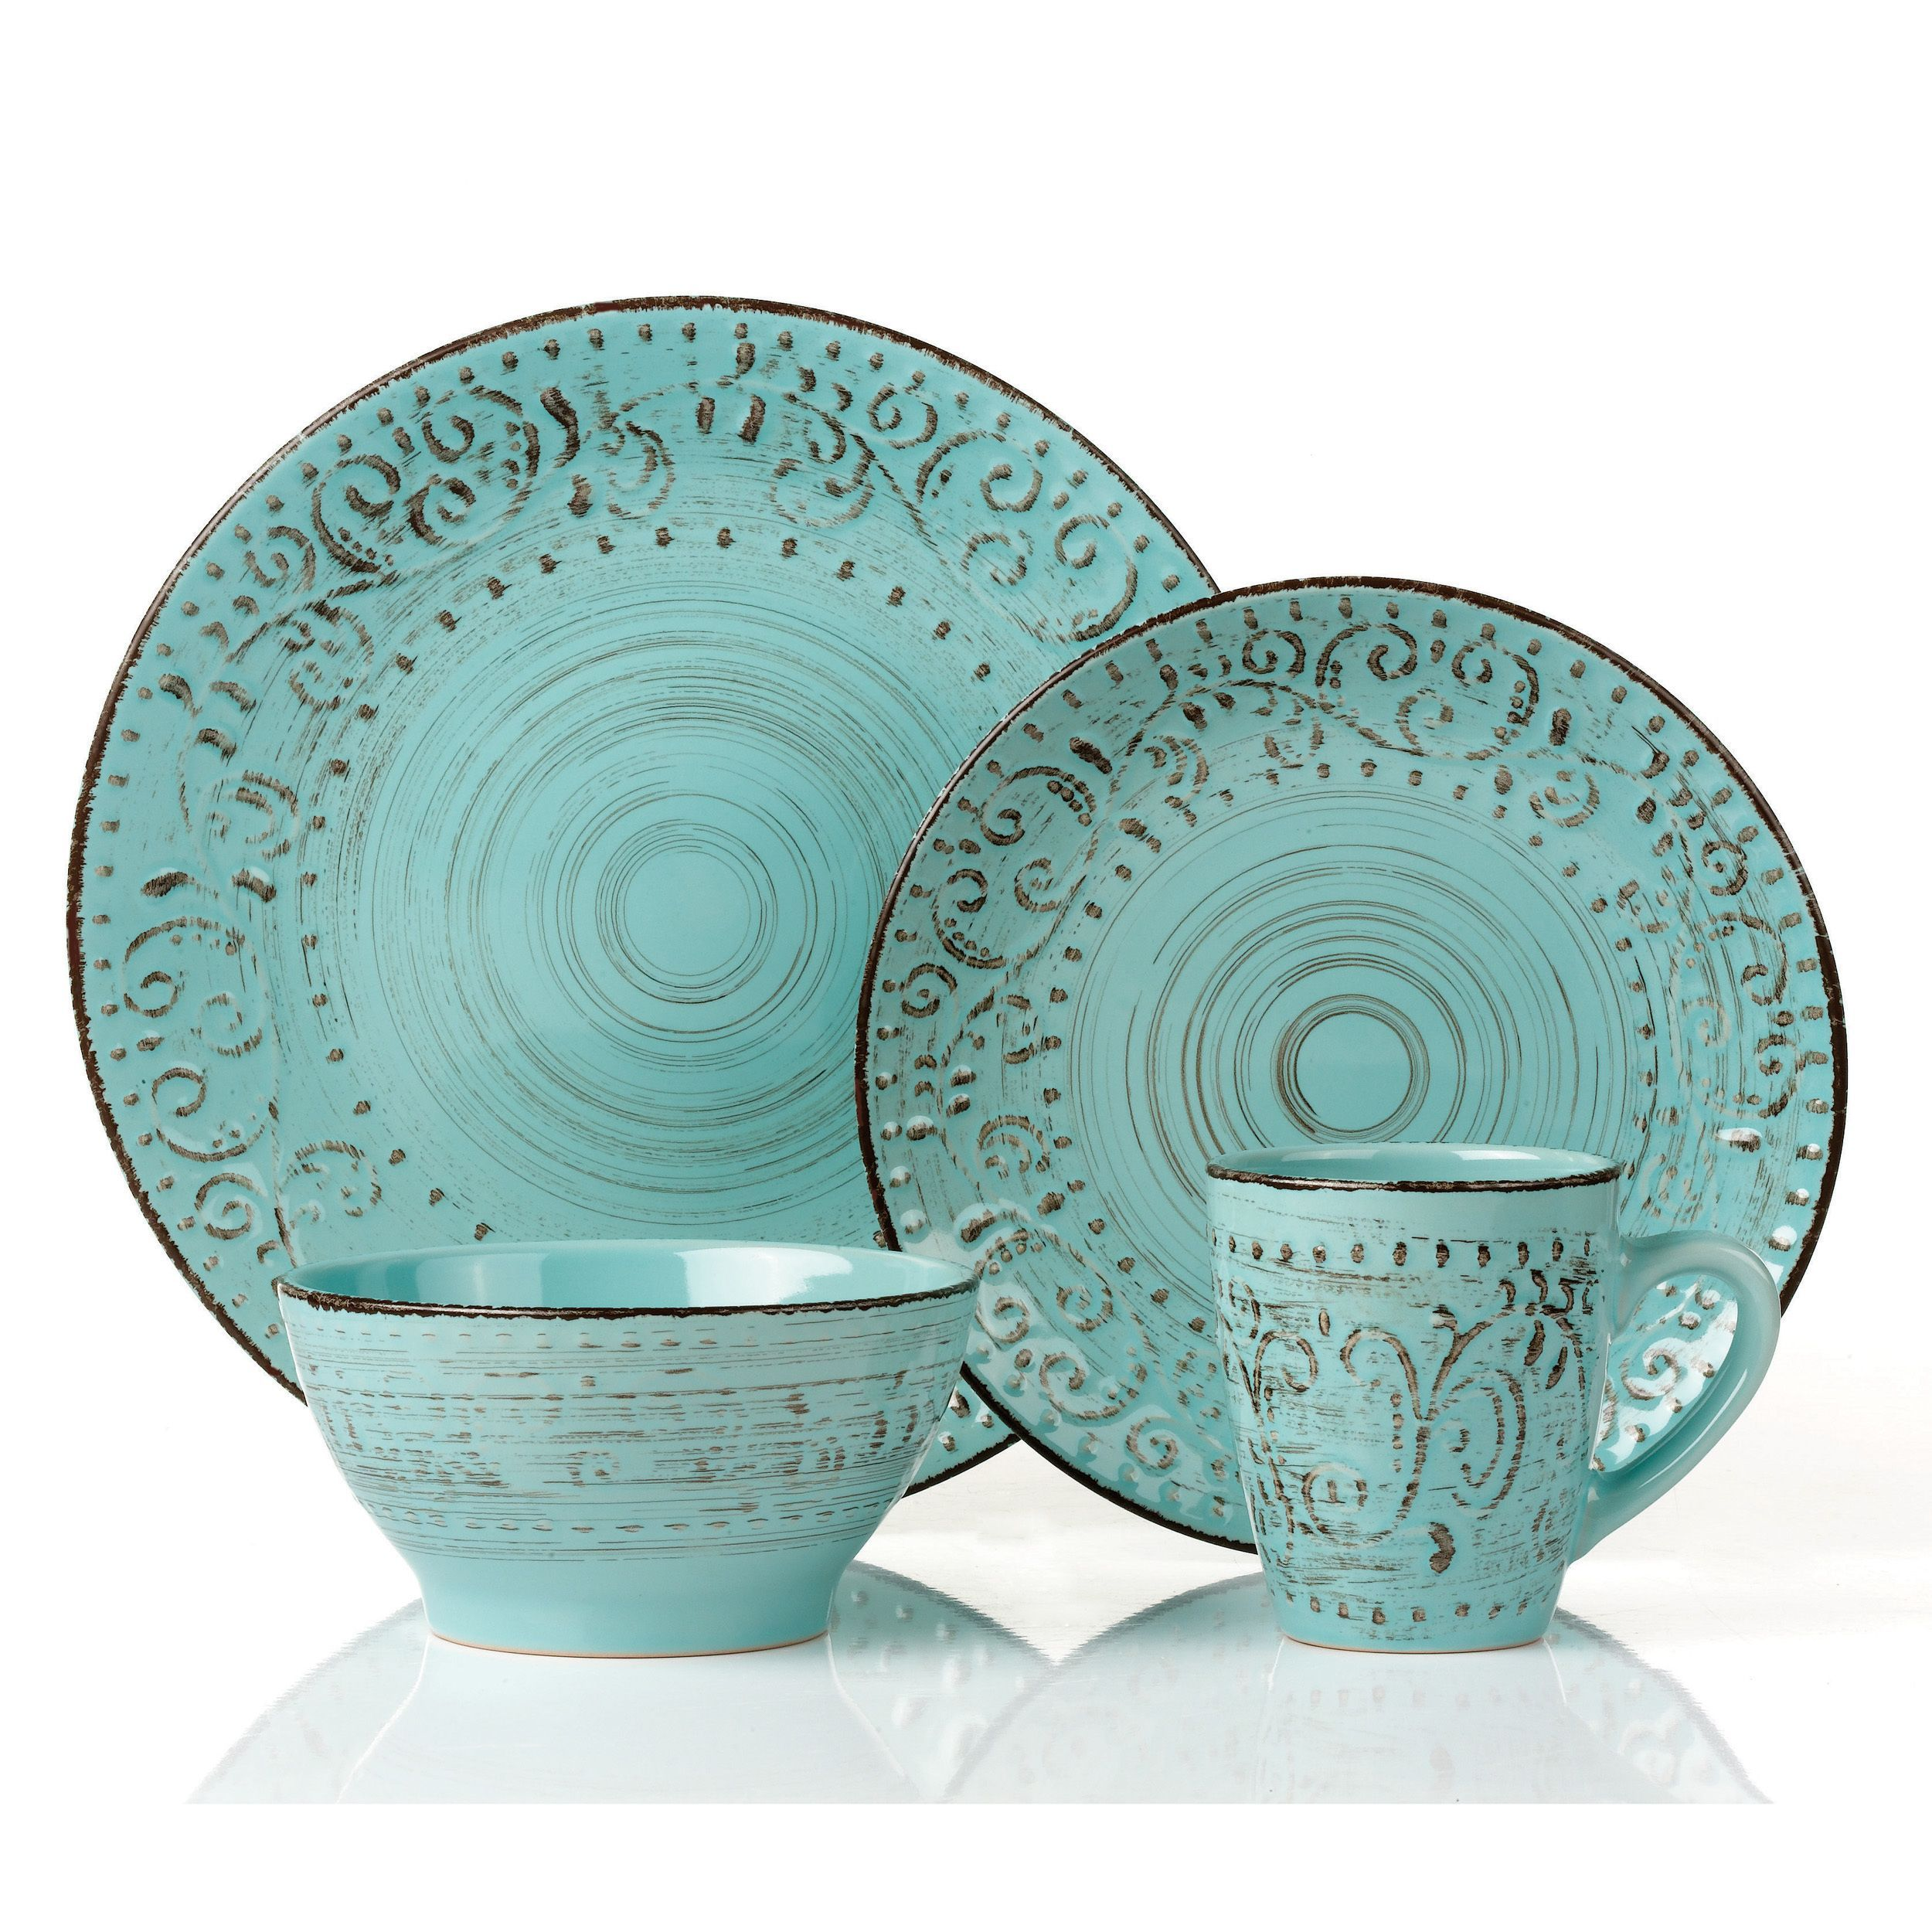 Hometrends Dinnerware Set & Lorren Home Trends Blue Green